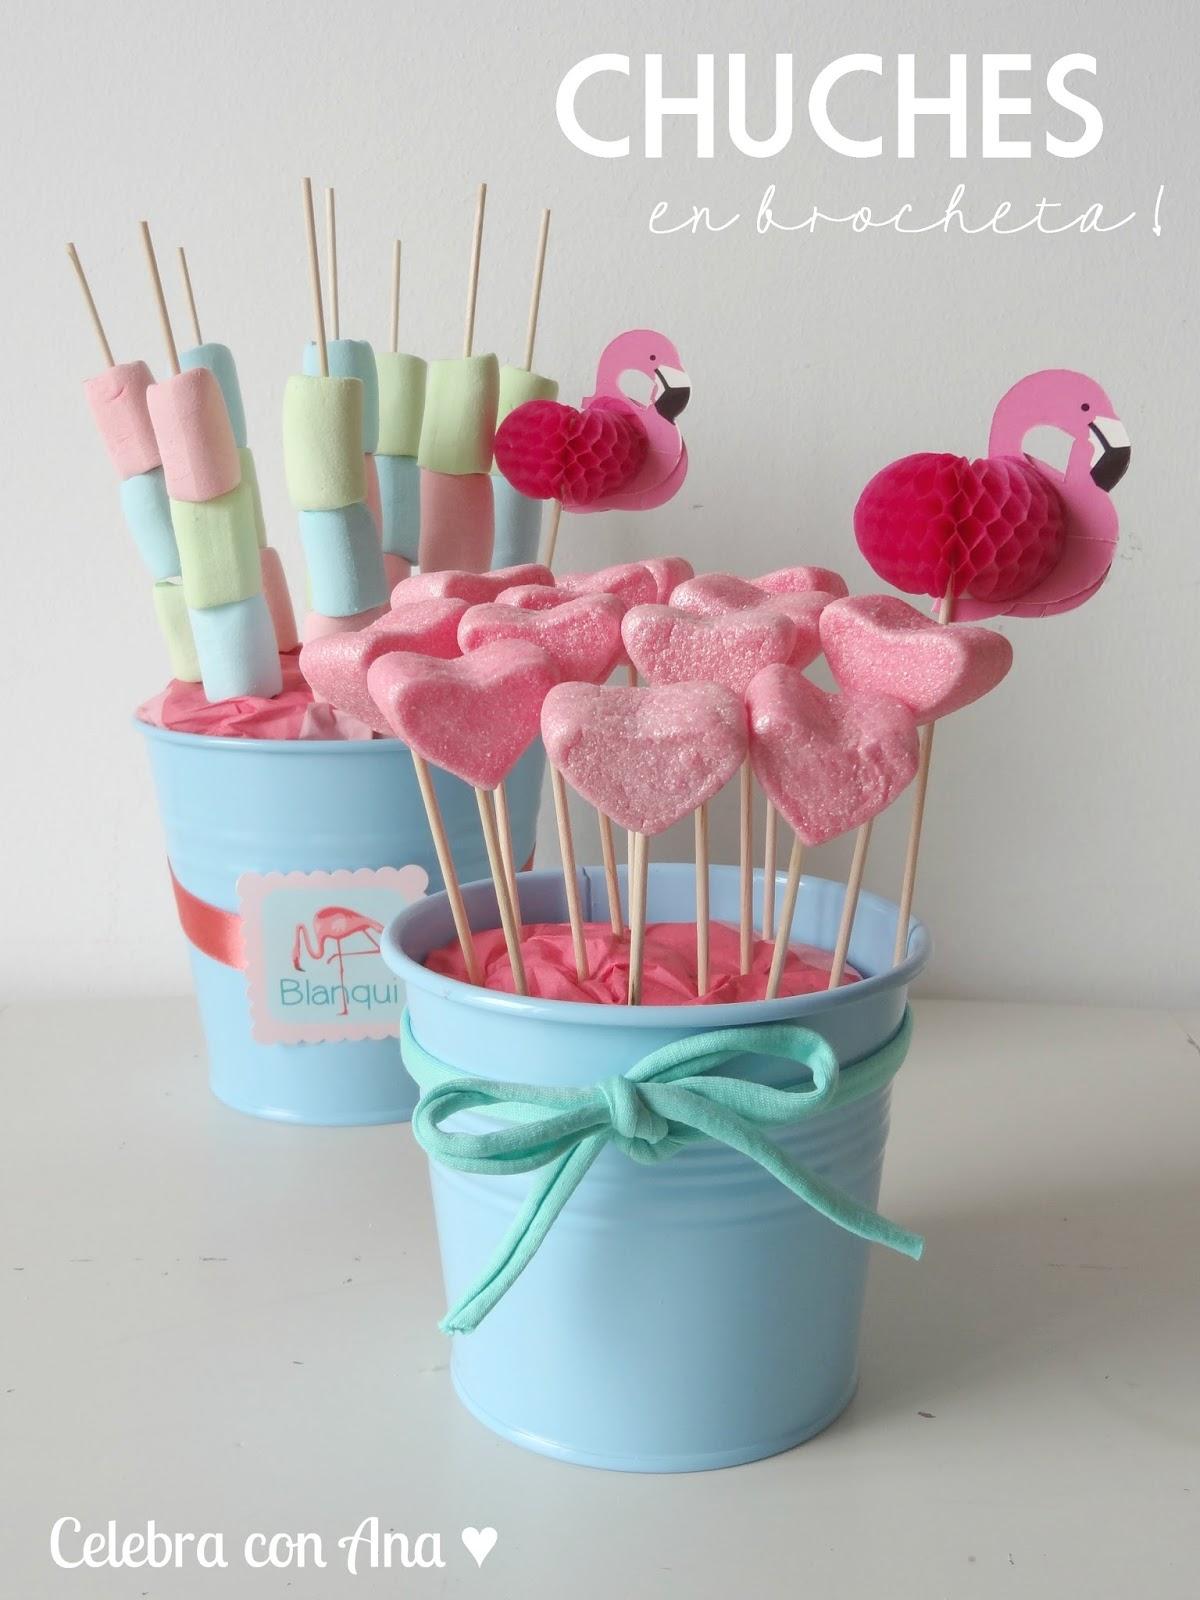 Celebra con ana compartiendo experiencias creativas - Ideas para decorar mesas de chuches ...